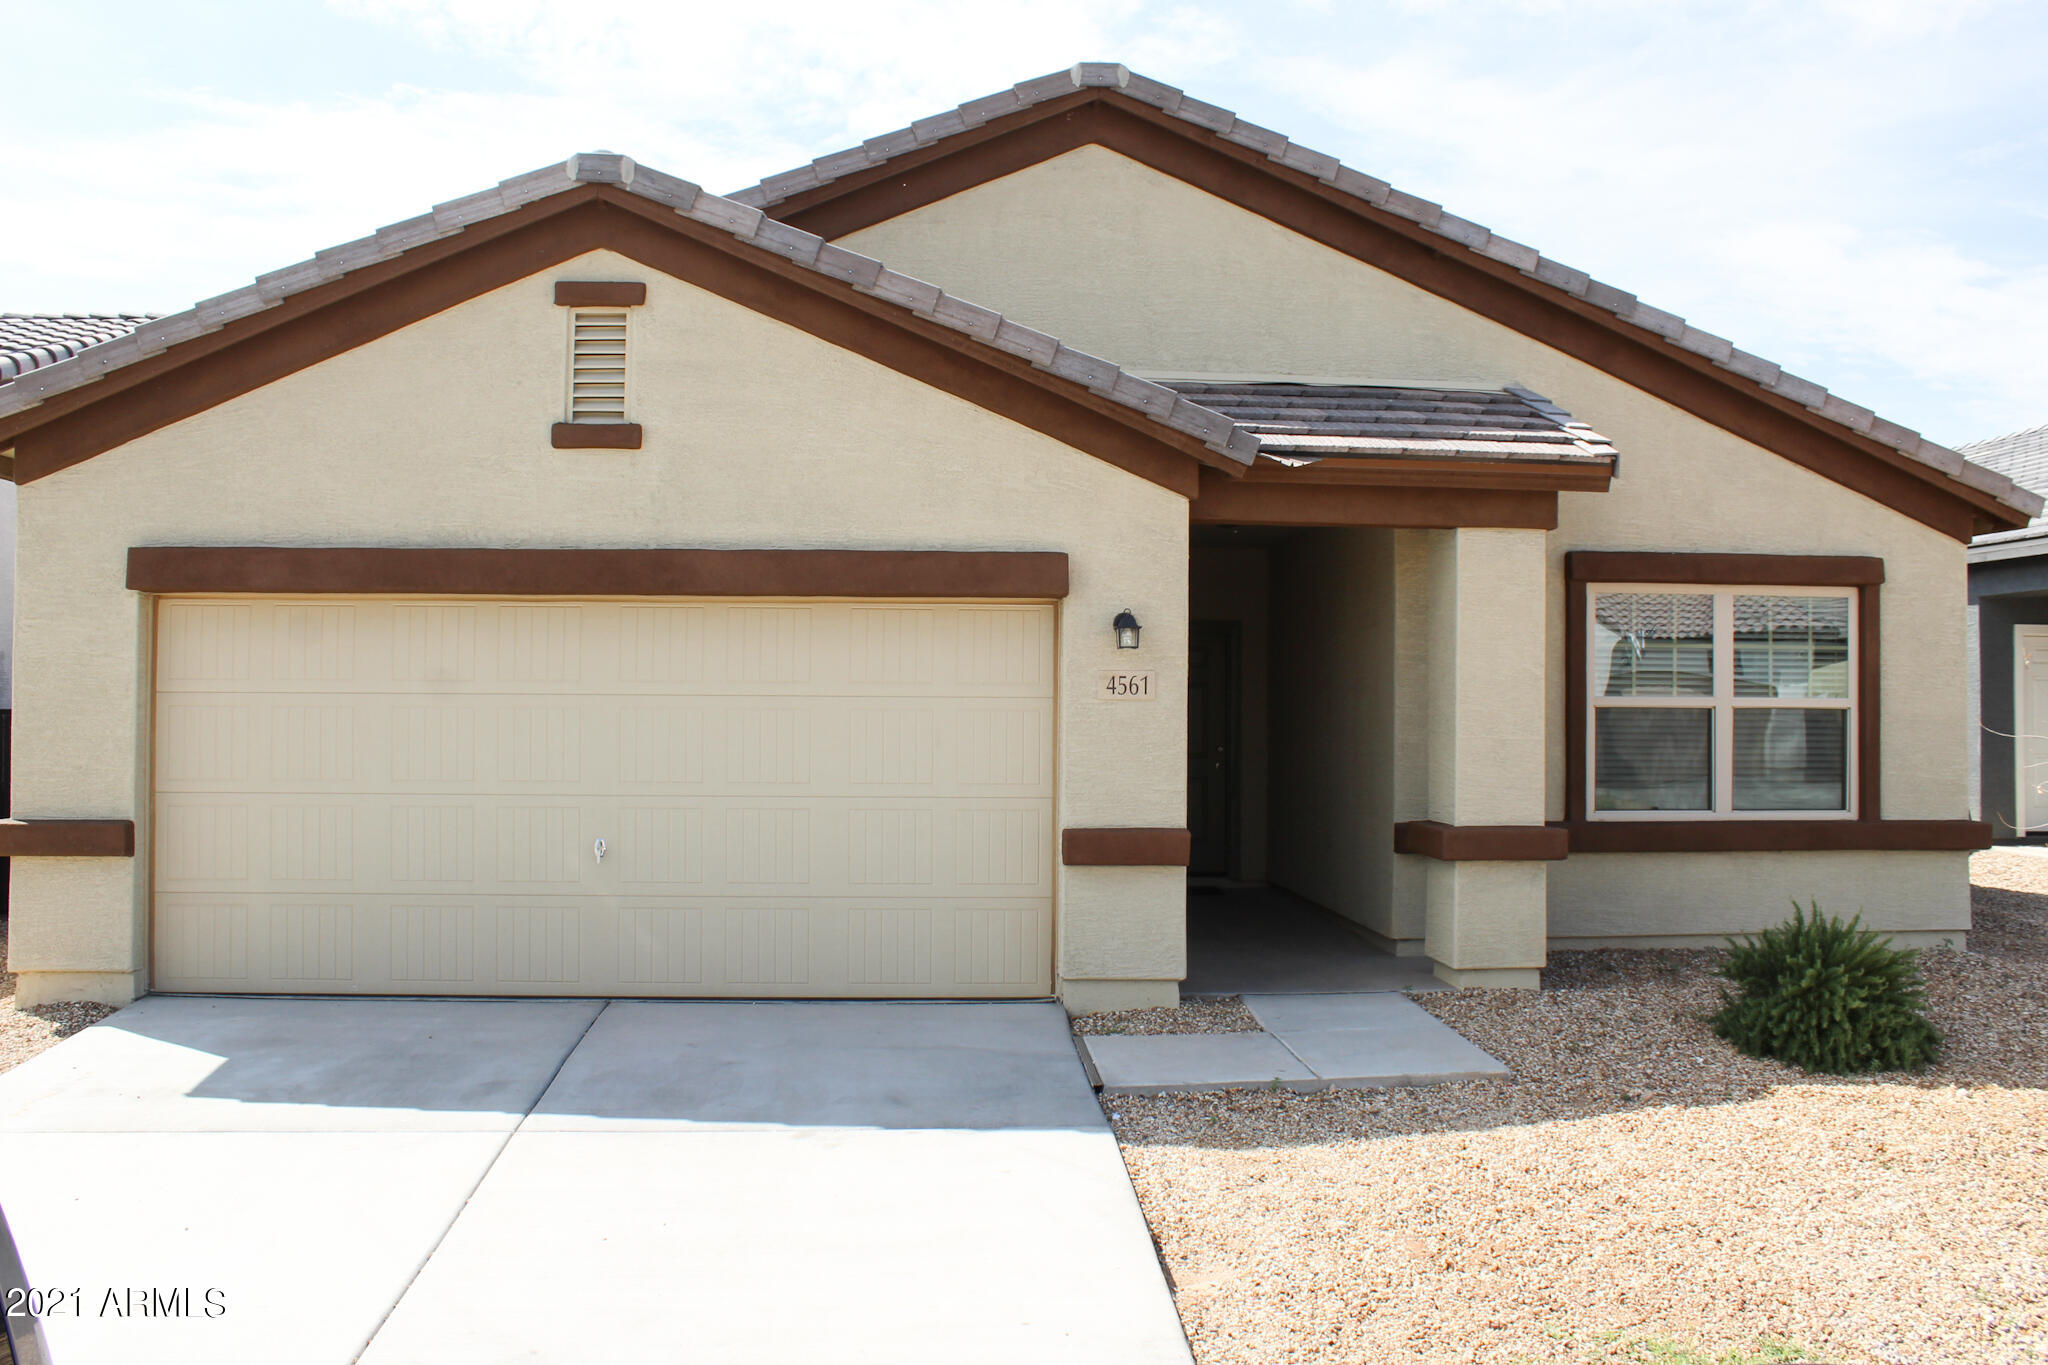 4561 FOLDWING Drive, Queen Creek, Arizona 85142, 4 Bedrooms Bedrooms, ,2 BathroomsBathrooms,Residential,For Sale,FOLDWING,6288934